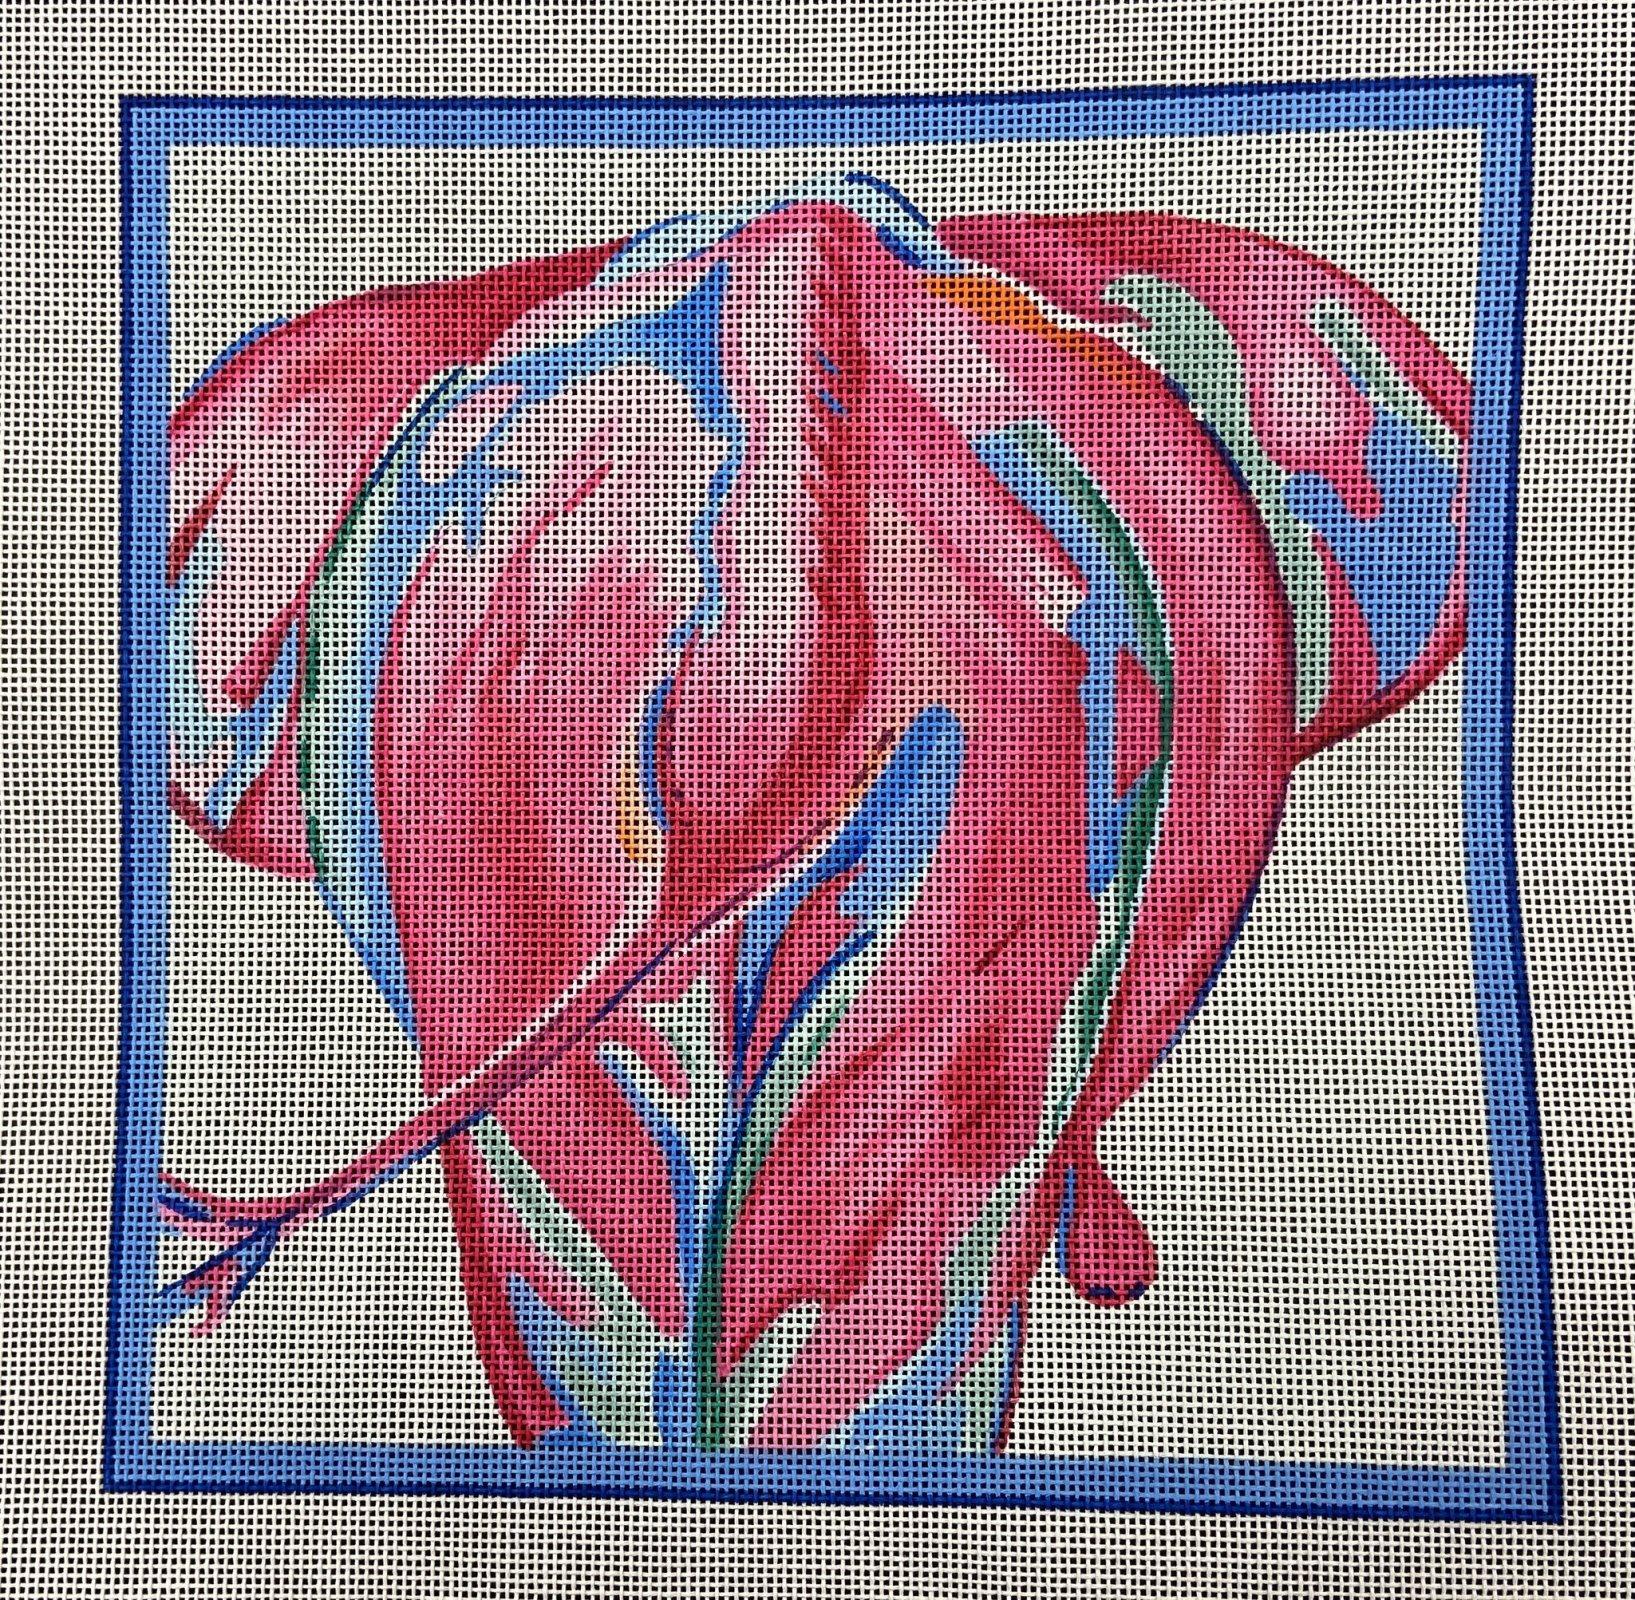 MCPL16 Elephant Tail Kate Dickerson